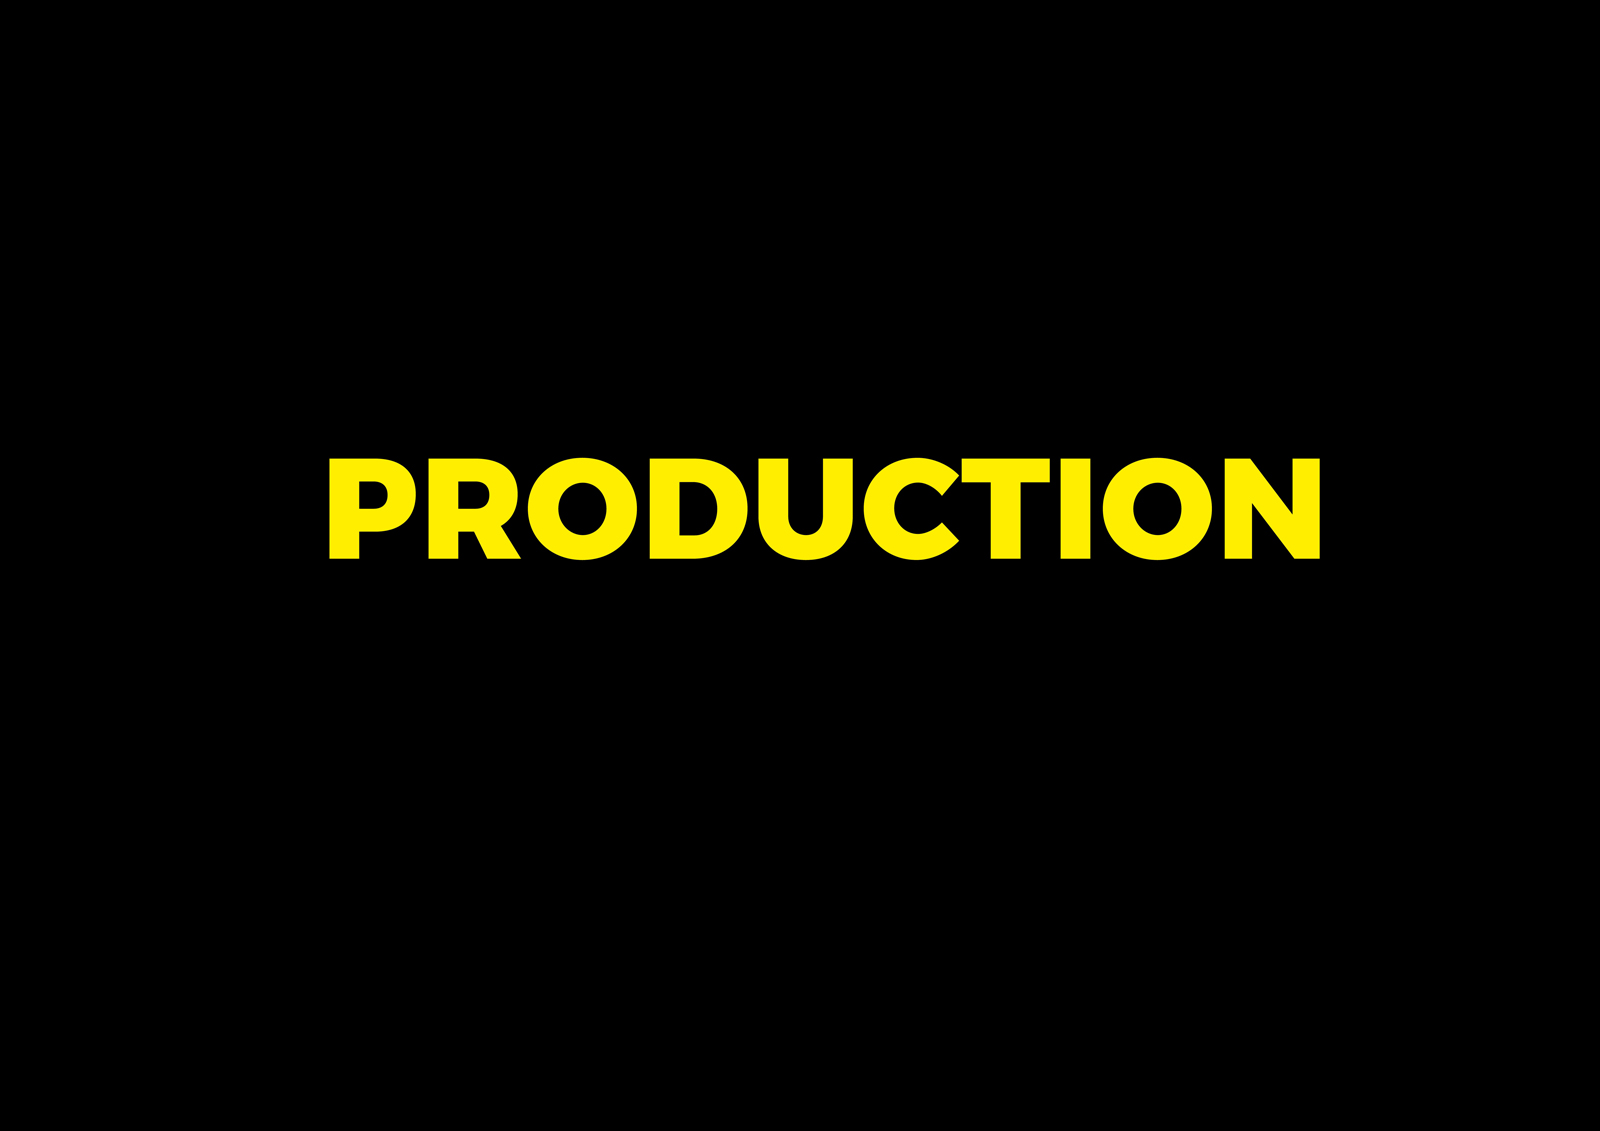 PRODUCTION-WEB.jpg